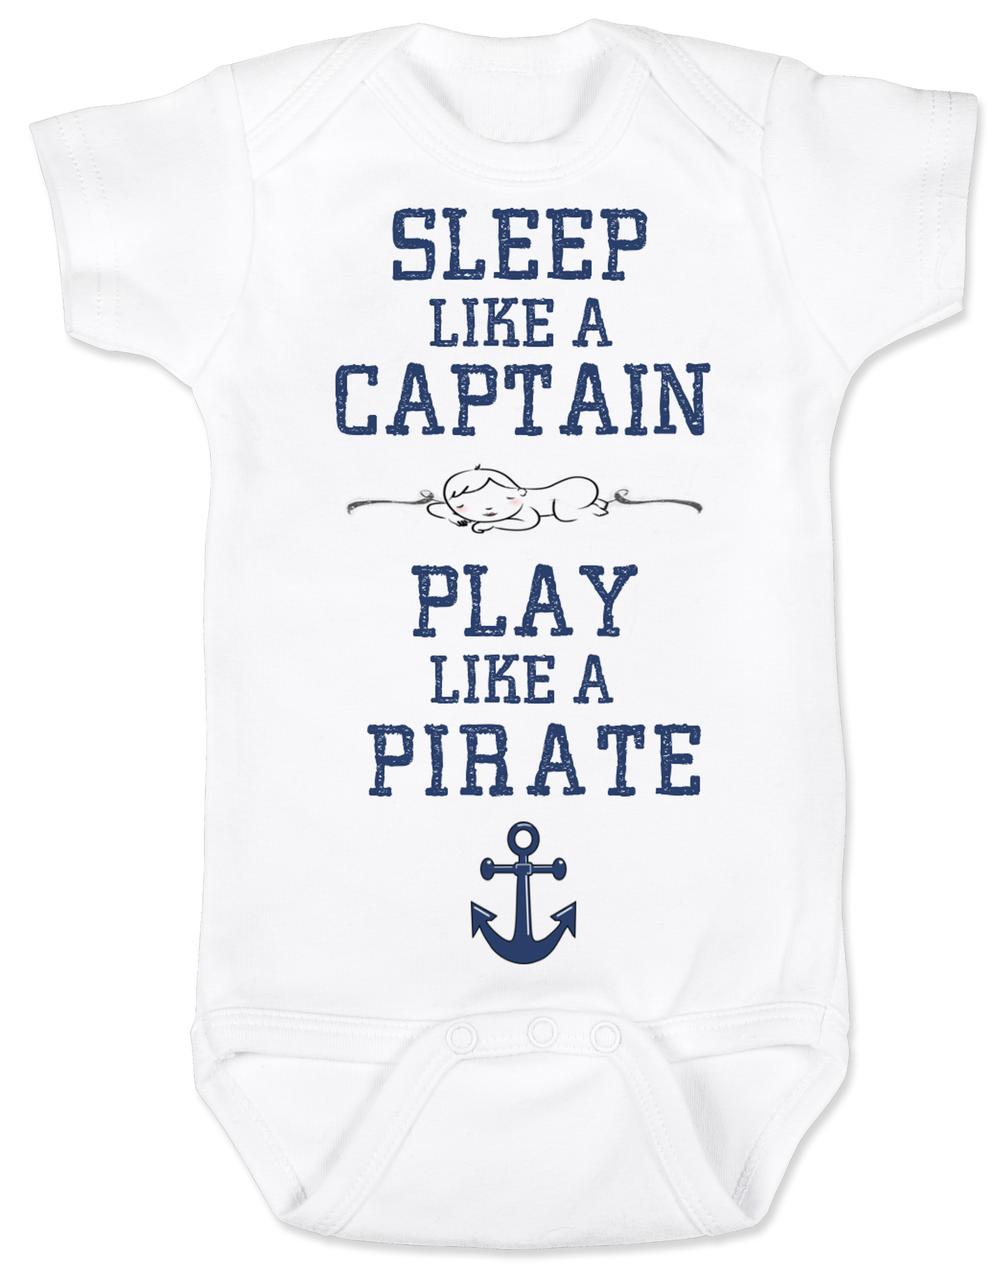 440ea9f4c65c Sleep Like A Captain, Play Like a Pirate, wipe me booty, Aaaaar,